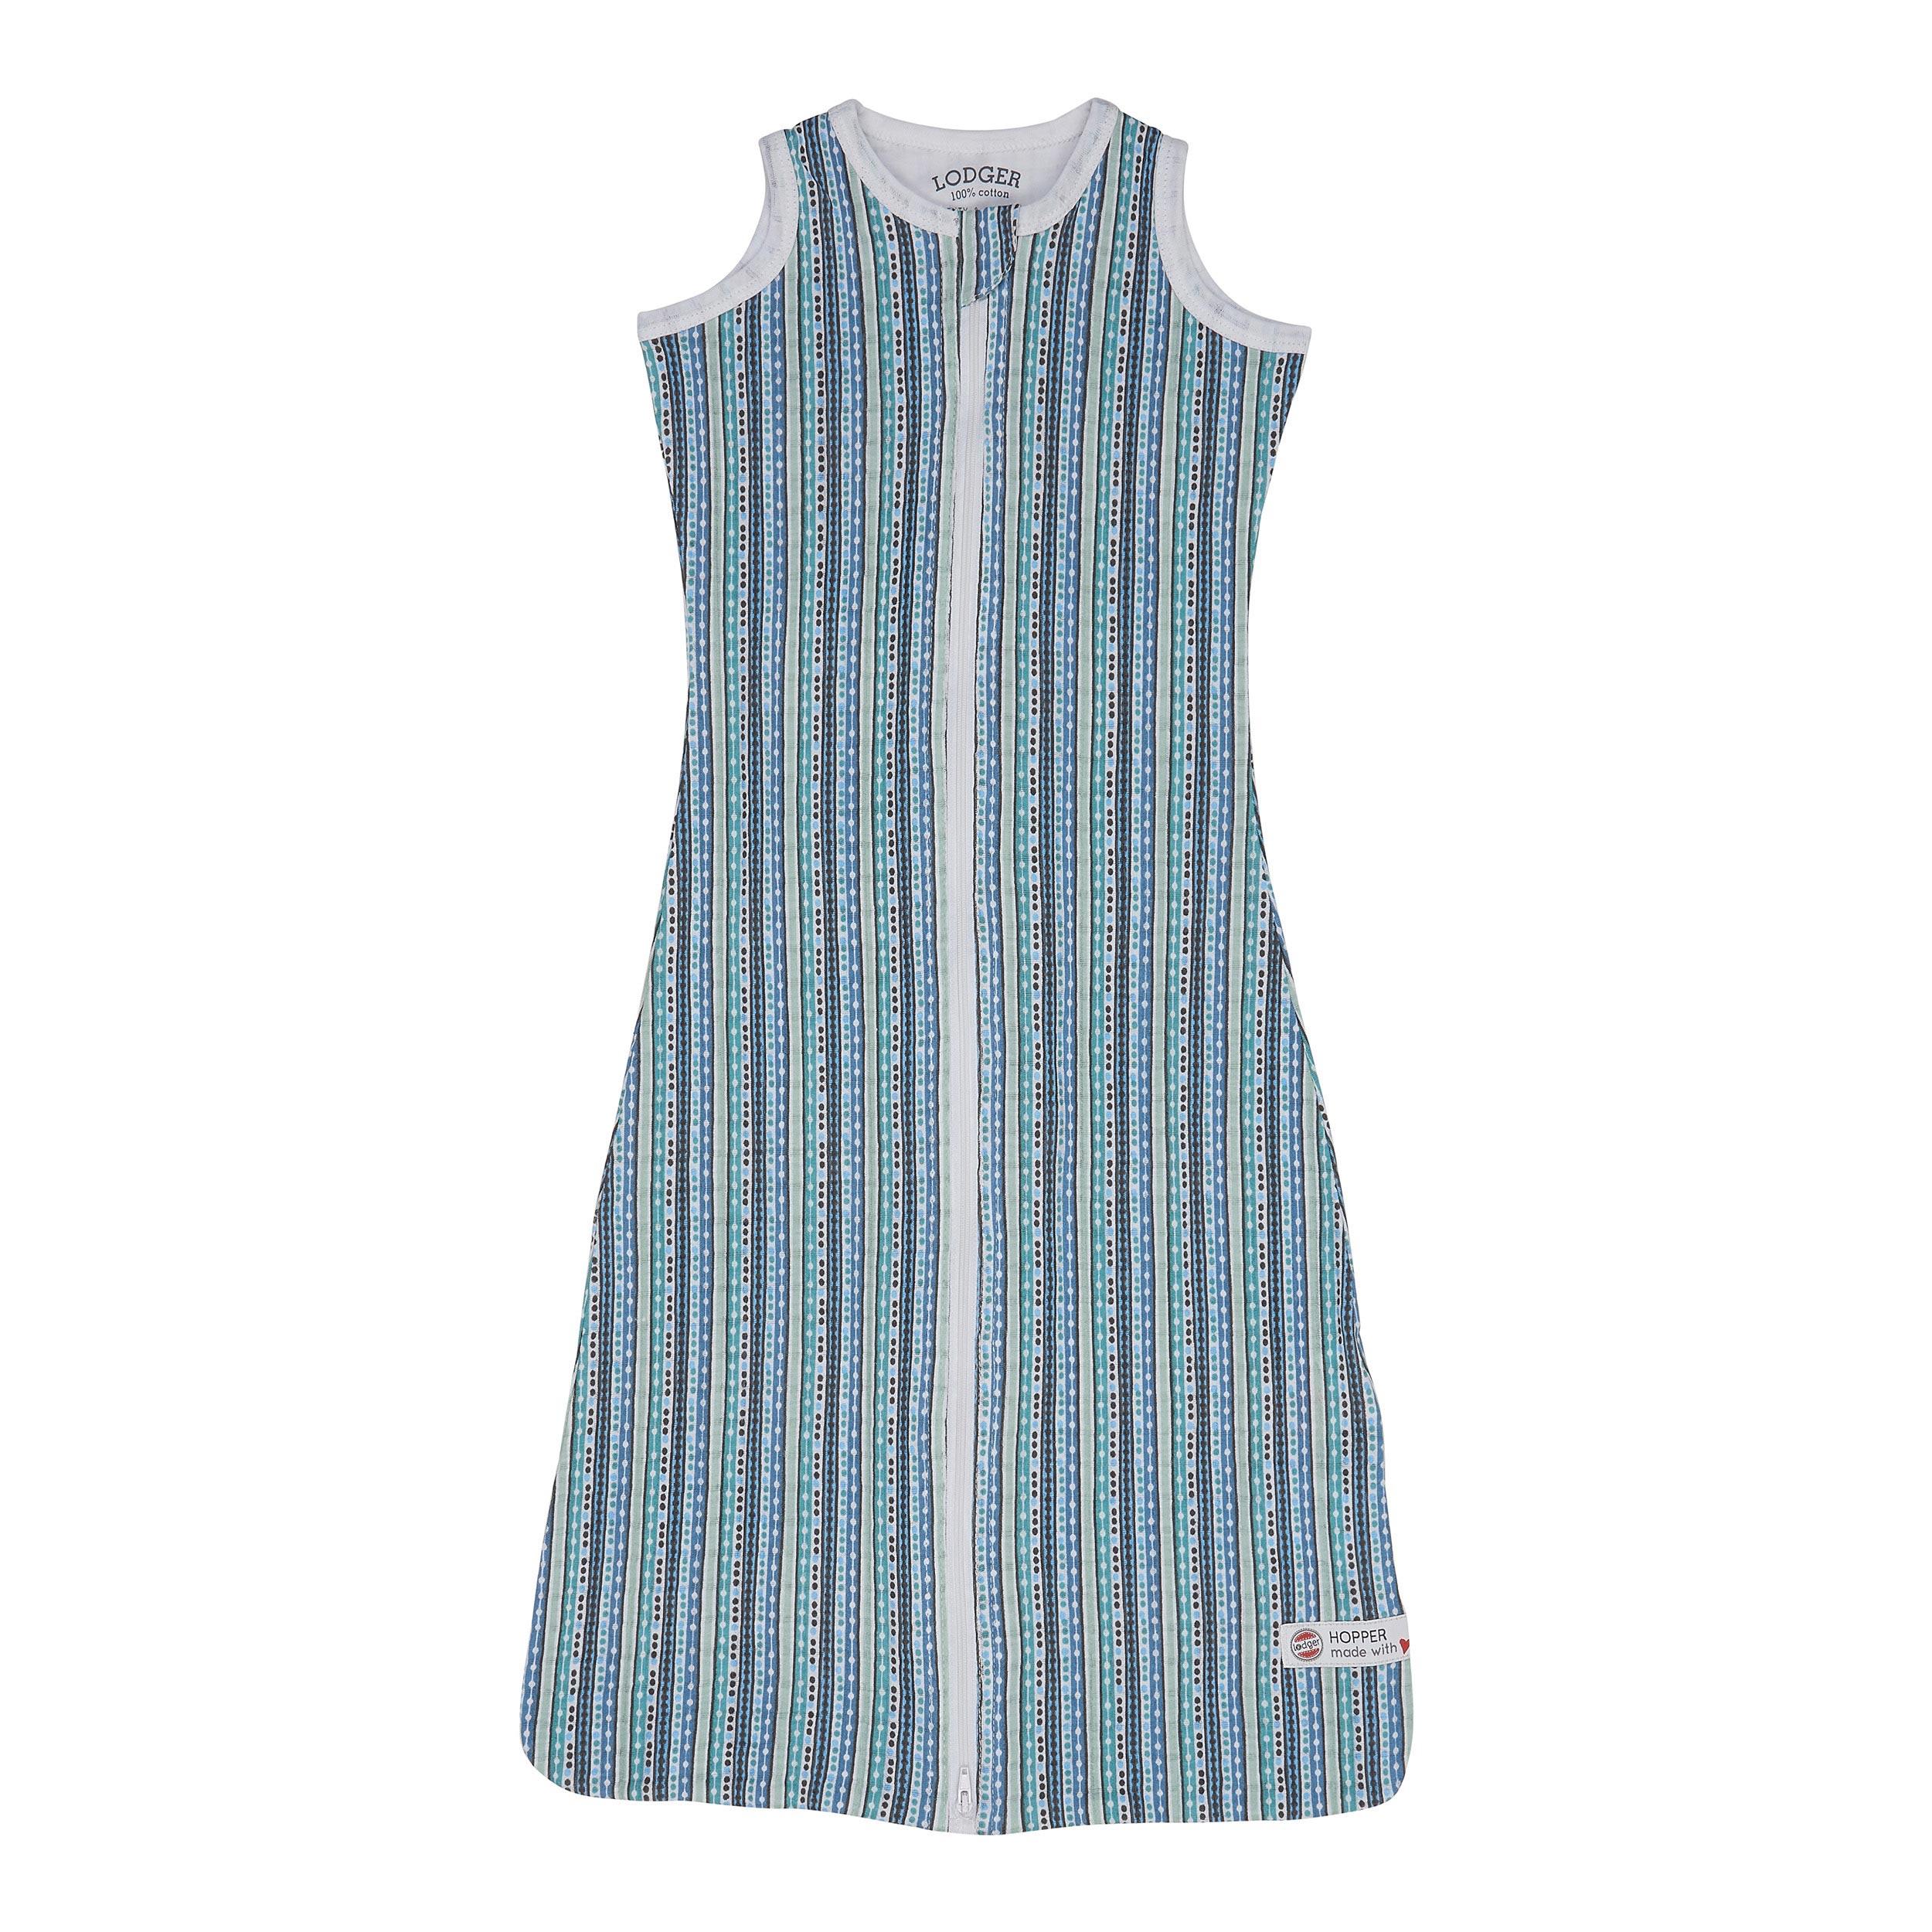 newest 65268 2b3d2 Hopper Sleeveless printed summer sleeping bag with 0.5 TOG